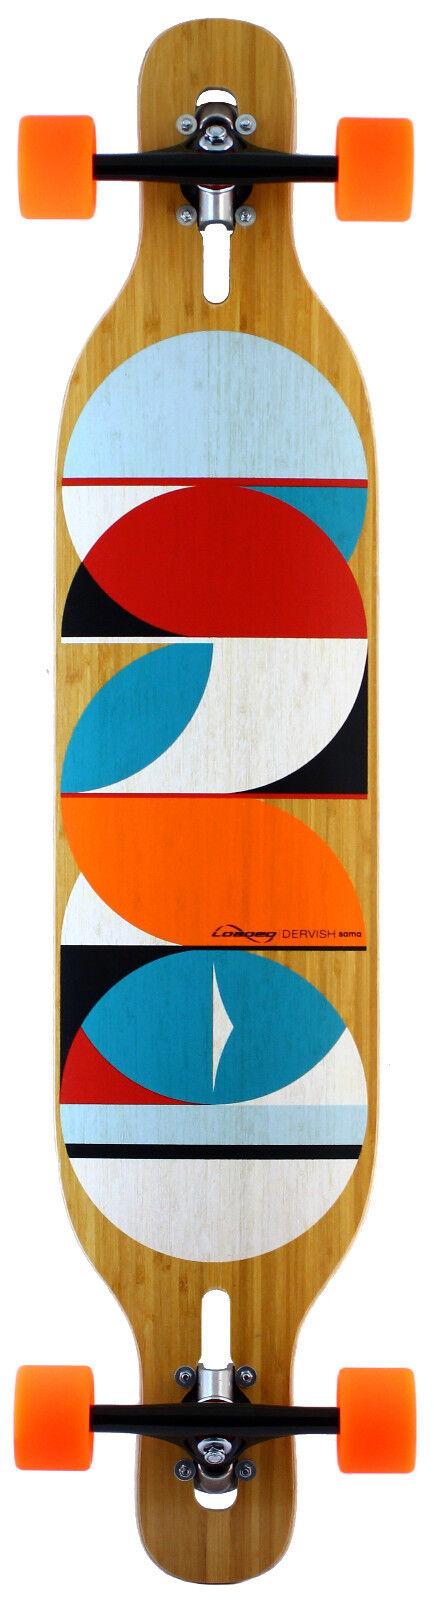 LOADED  Dervish Sama FLEX 1 Longboard completo